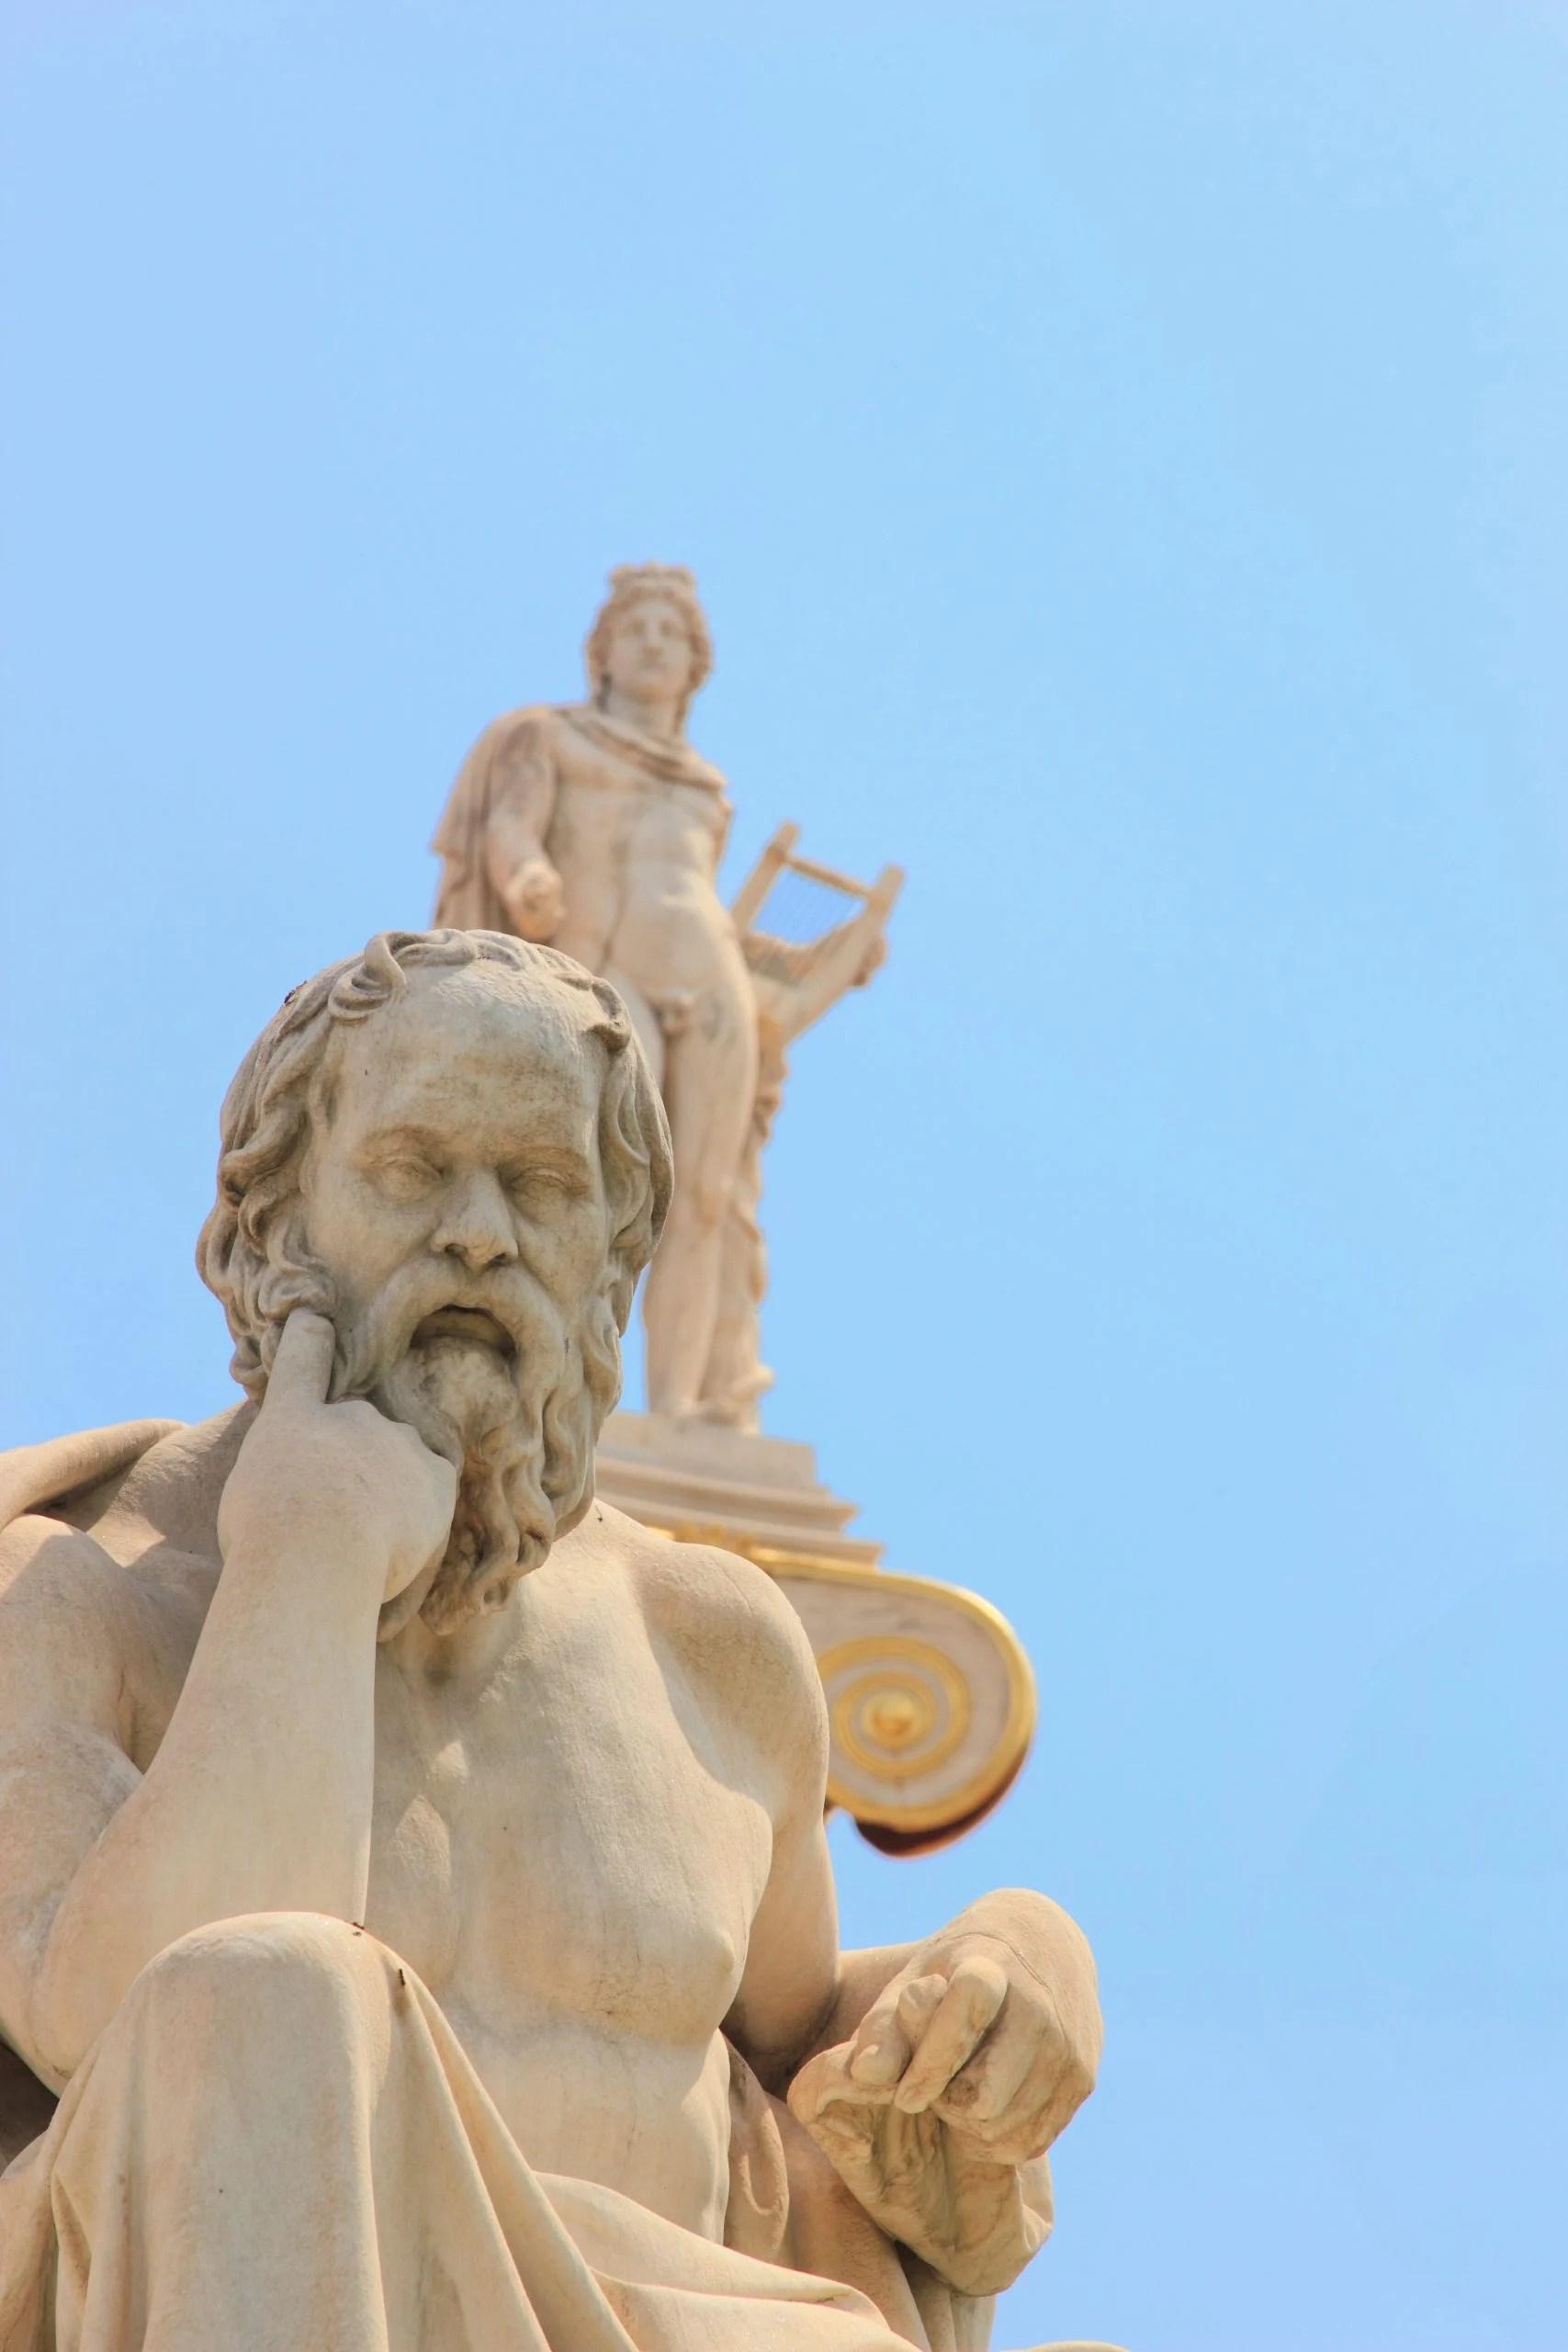 statue of philosopher, Plato who understood challenges